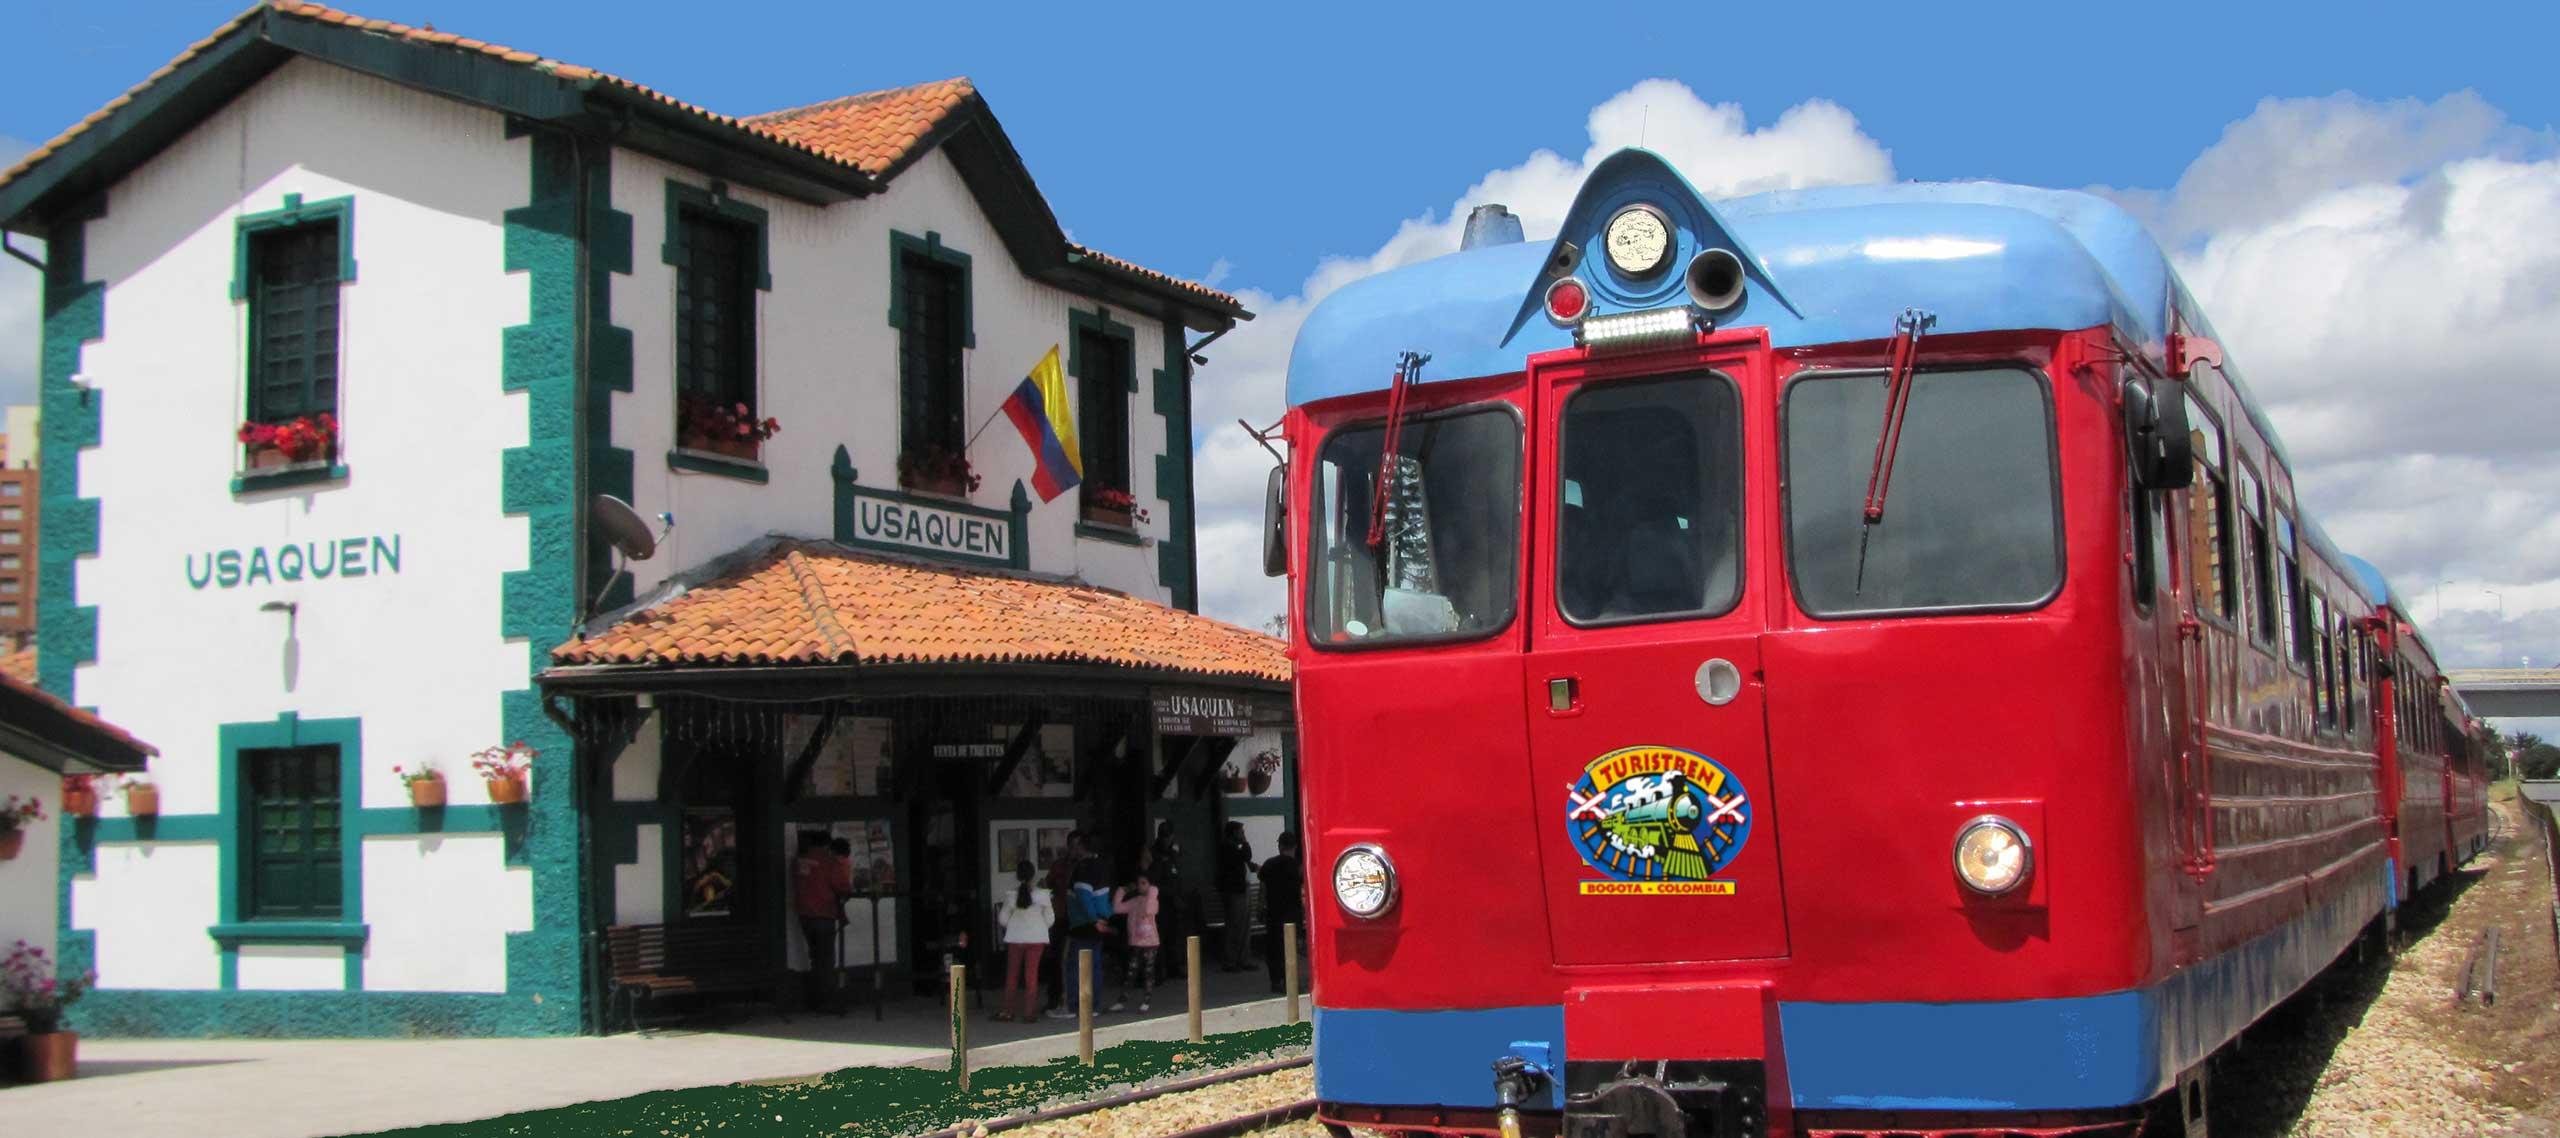 Train in Colombia